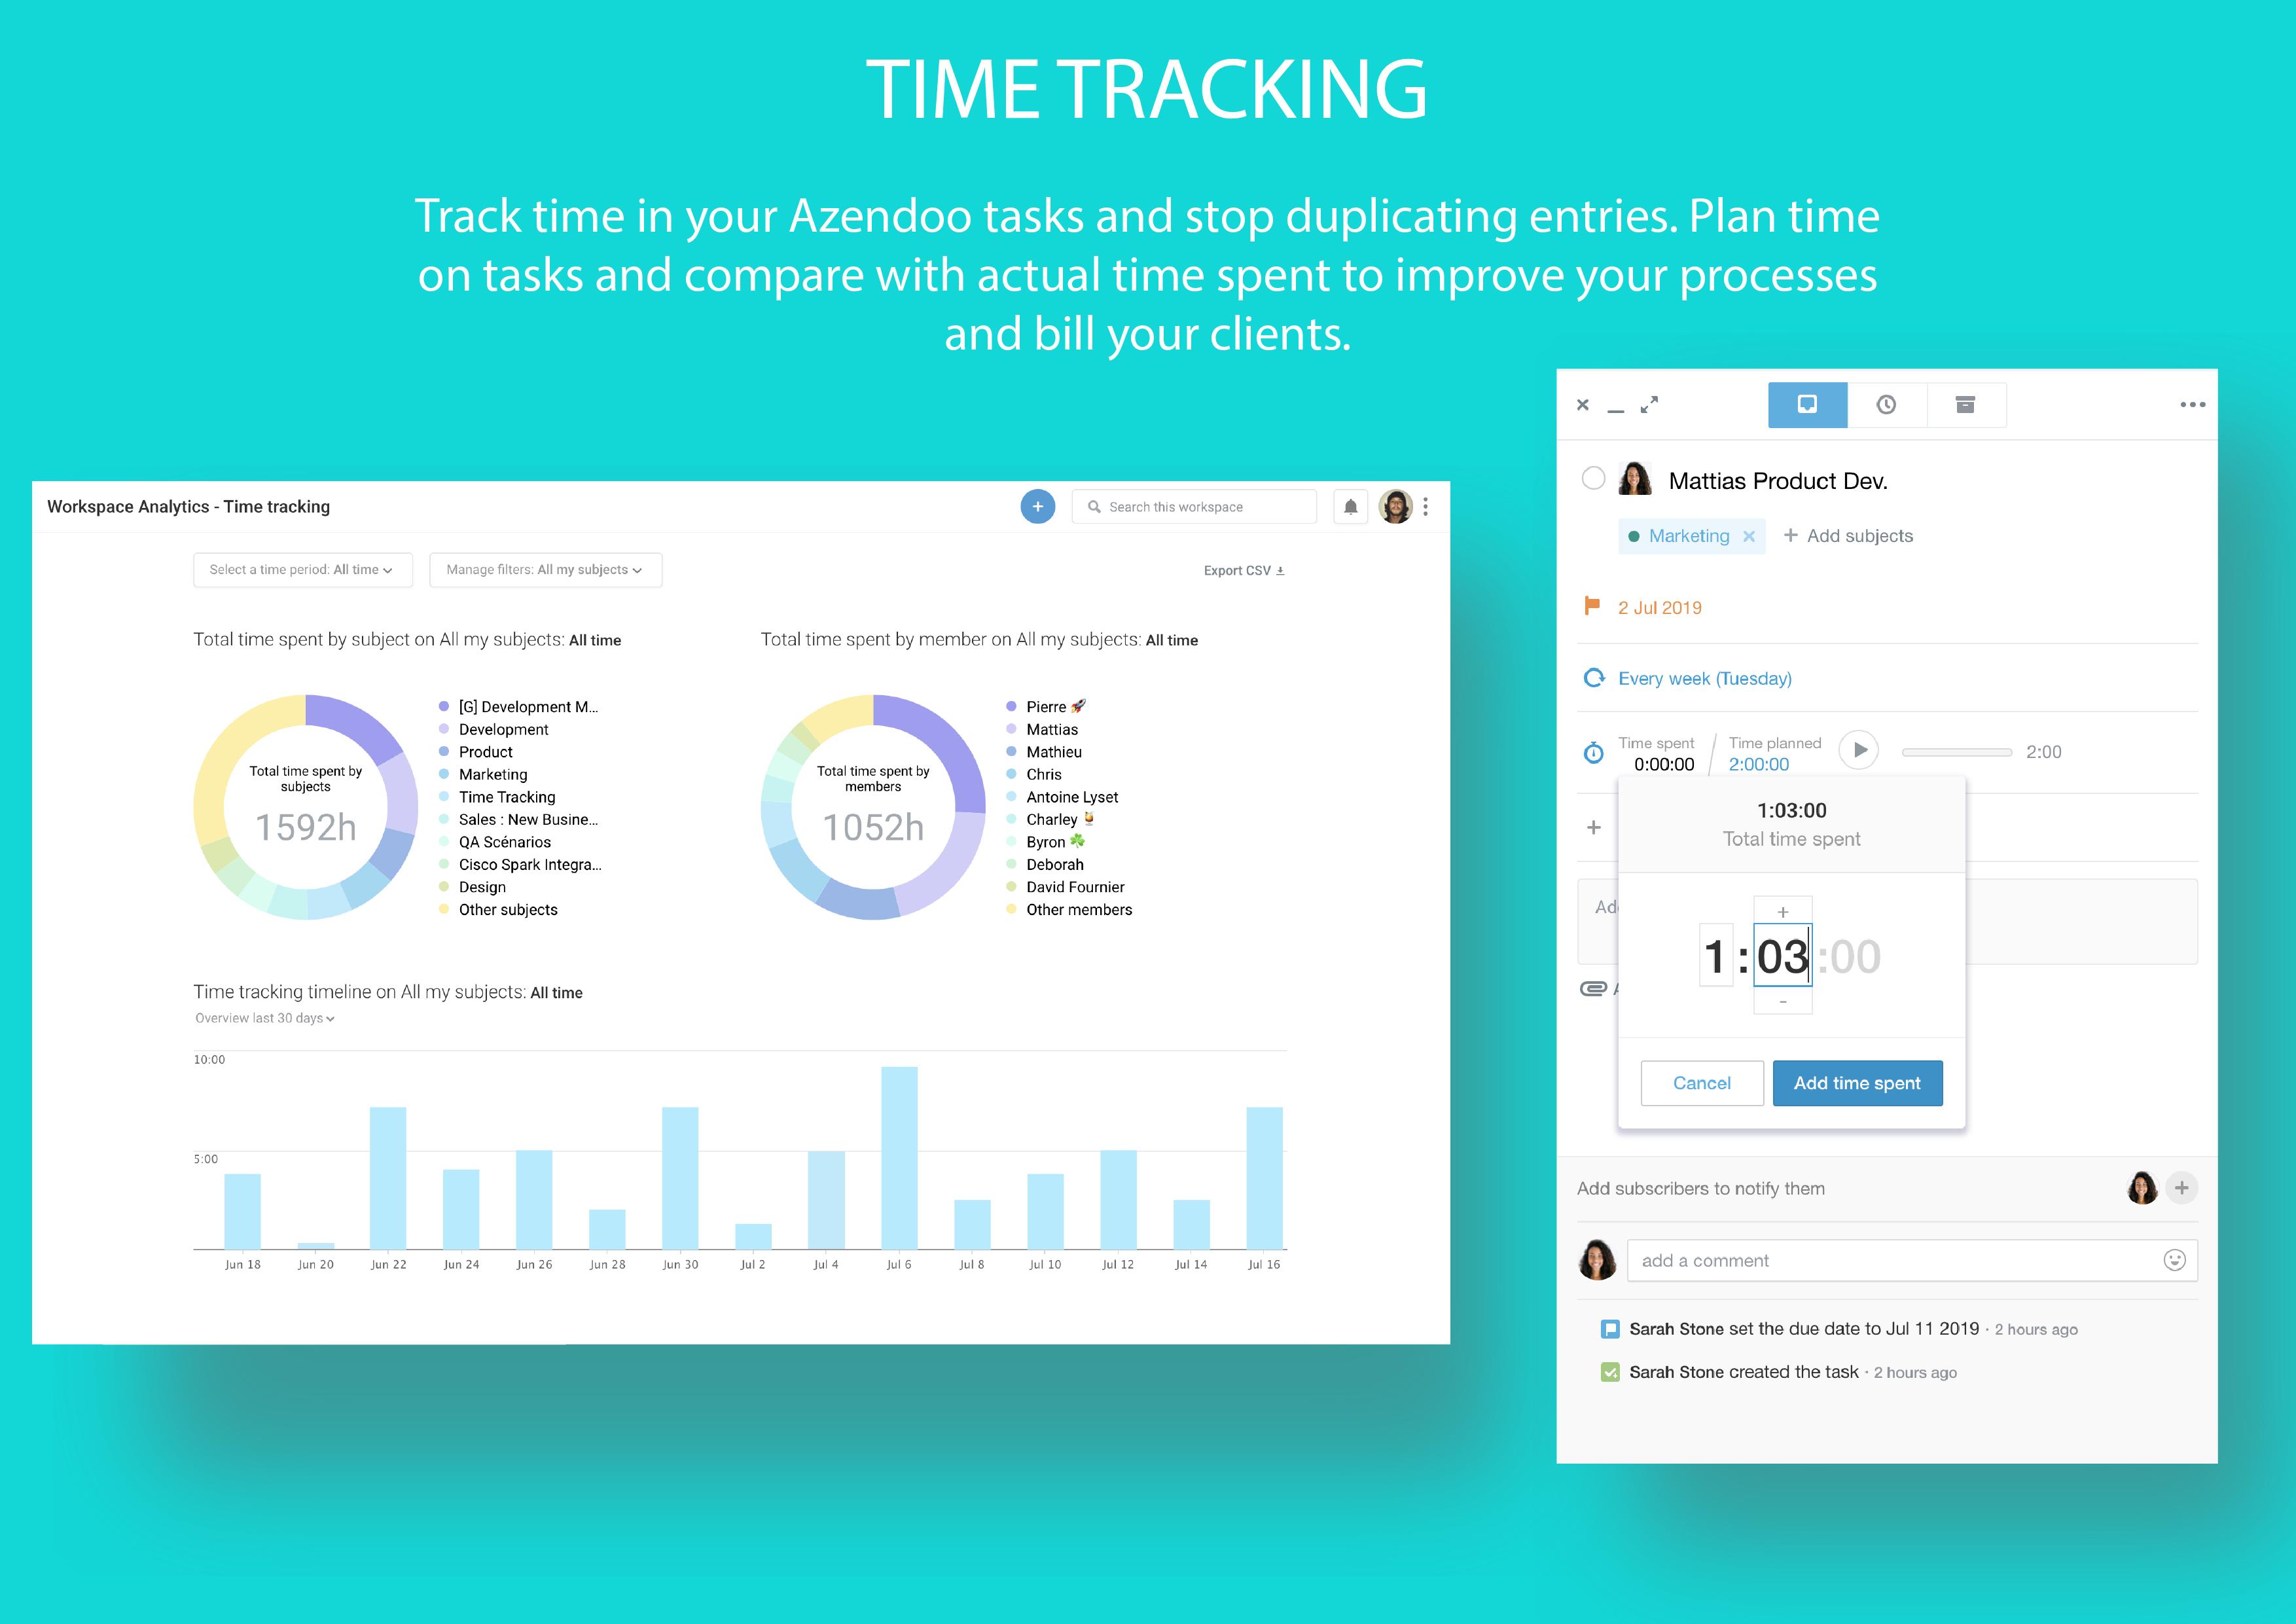 Track Time spent on teamwork and tasks